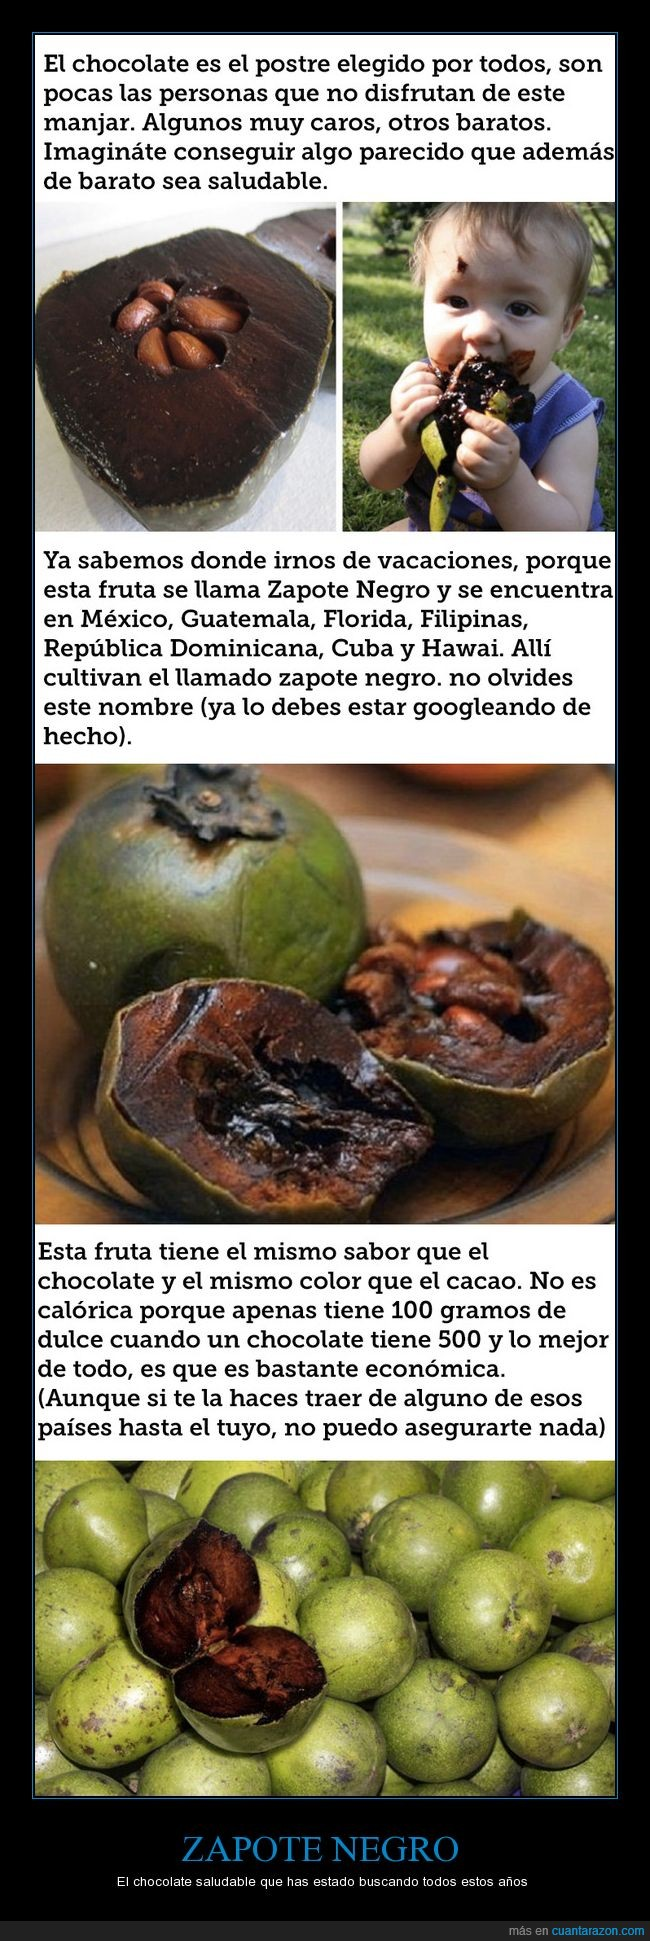 chocolate negro,fruta,zapote negro